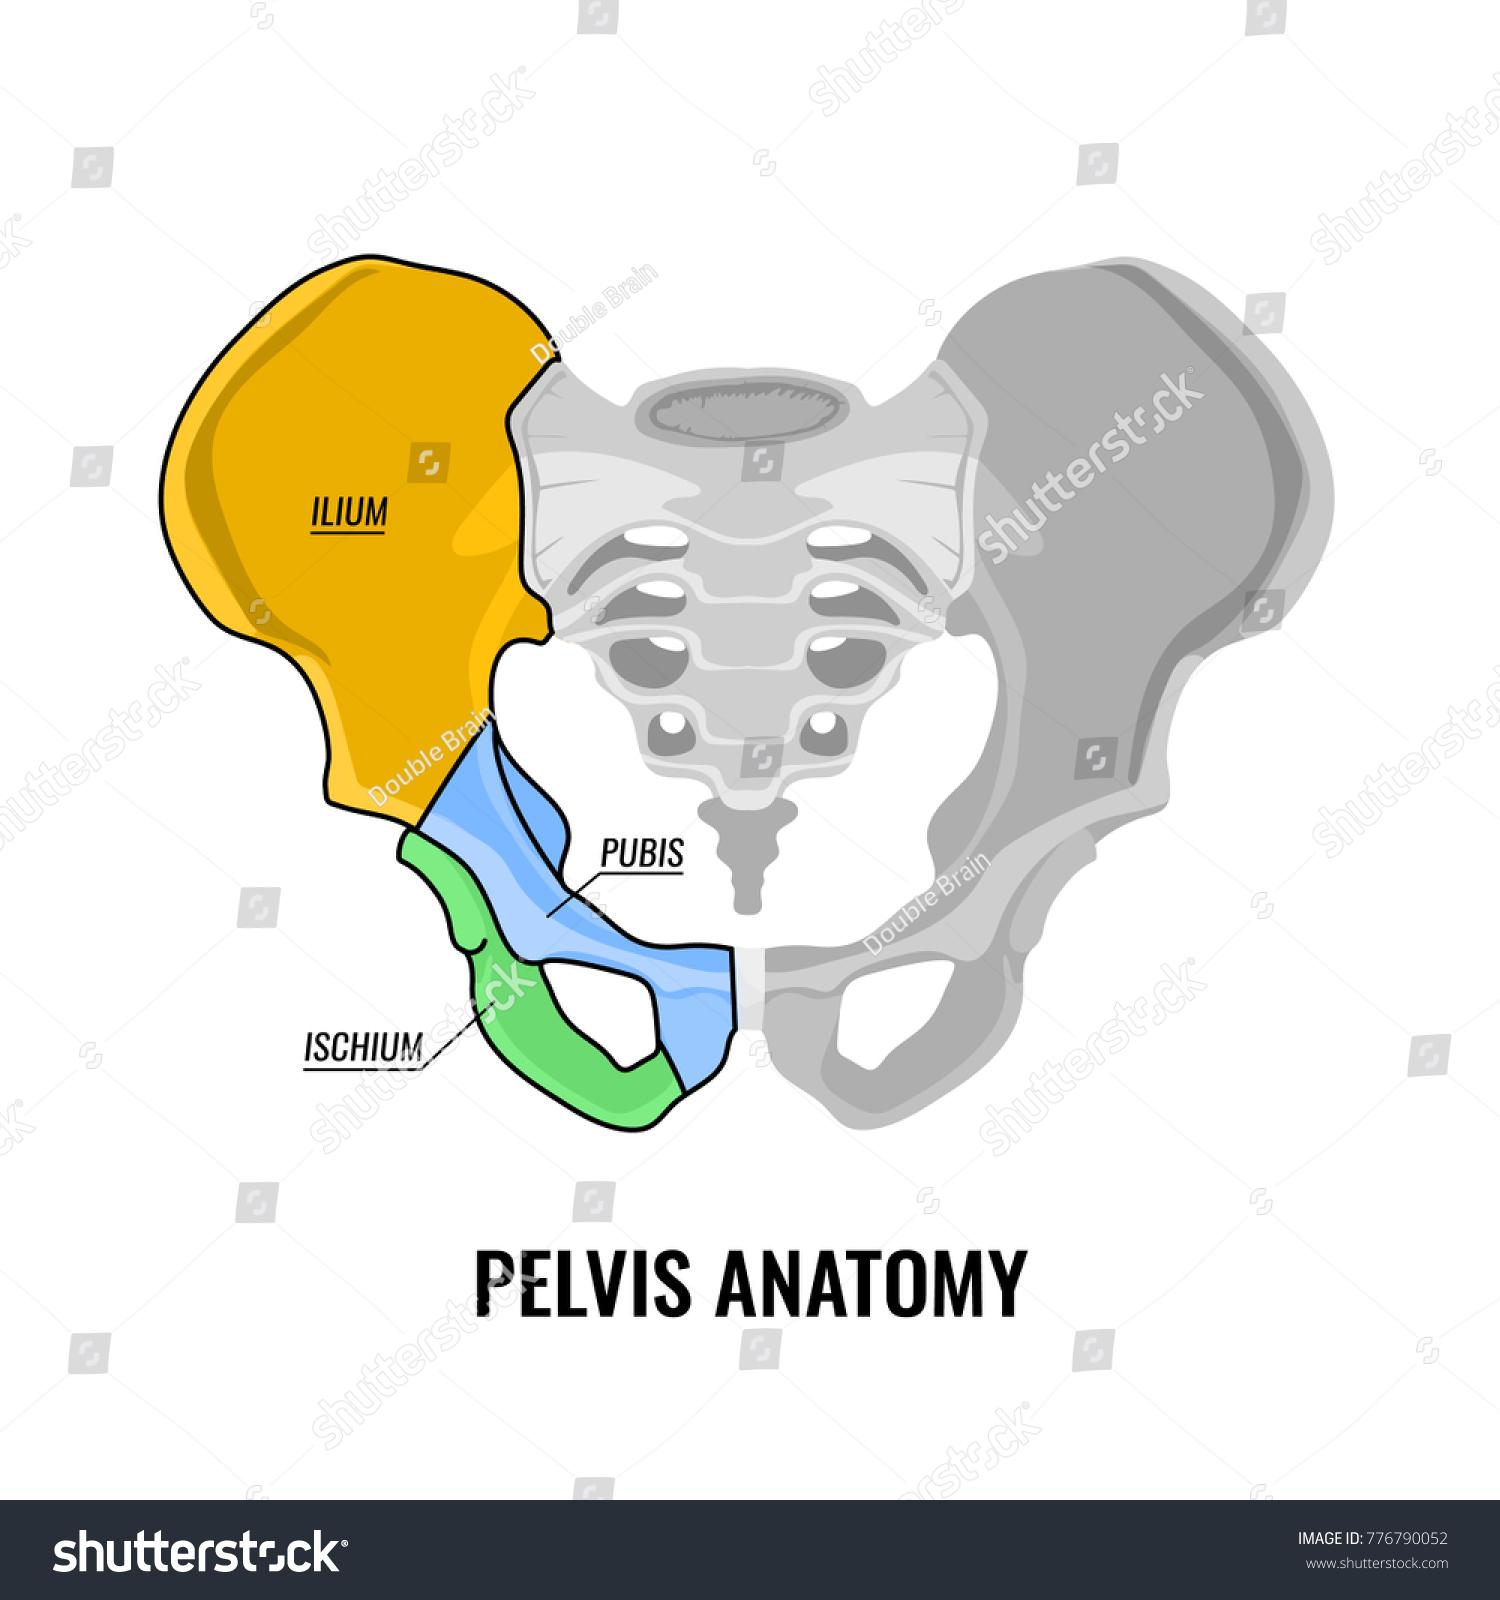 Human Male Anatomy Scheme Main Pelvis Stock Vector 776790052 ...